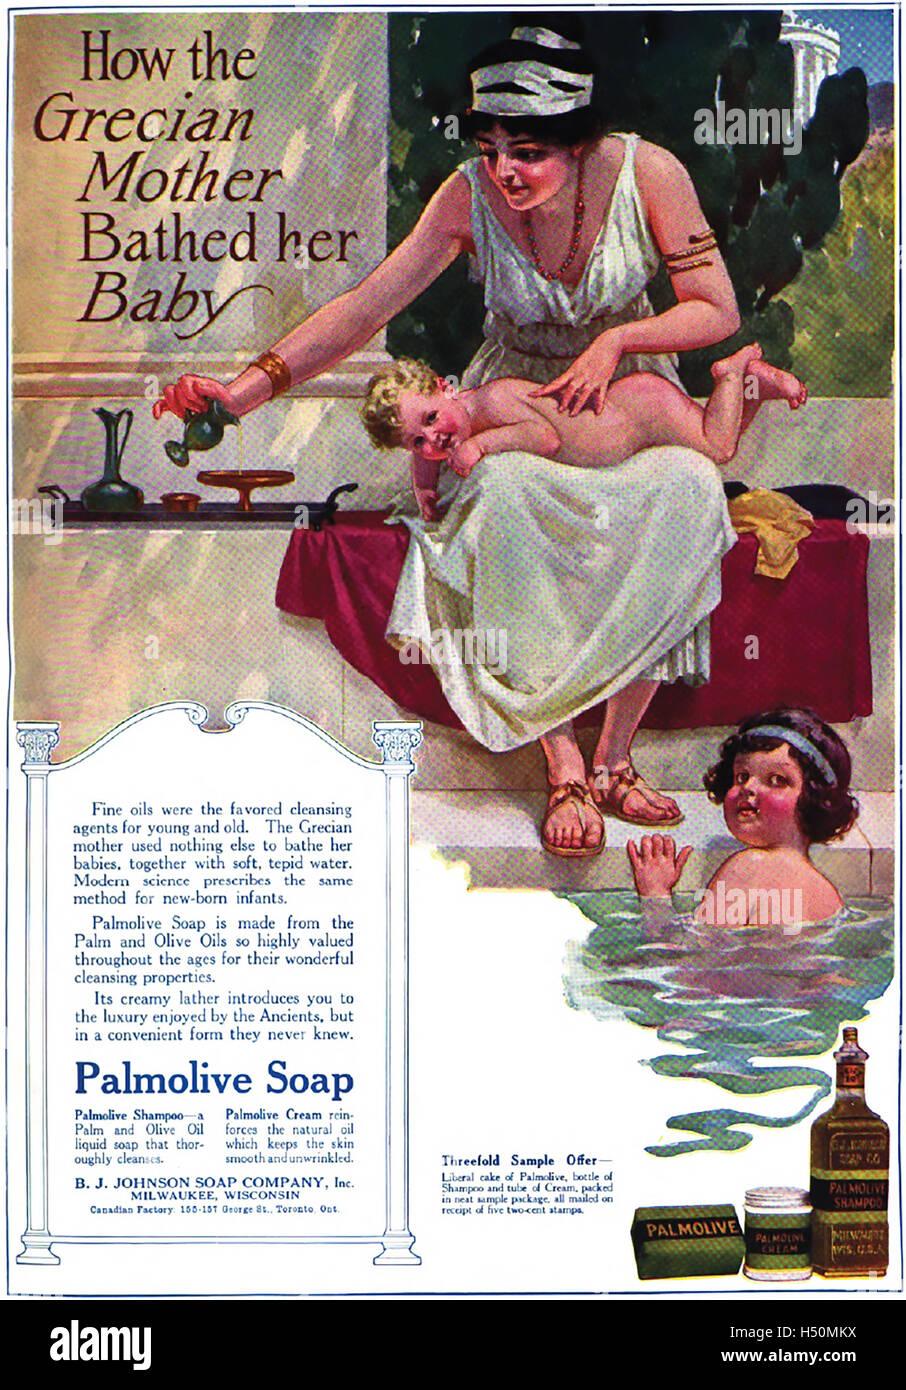 PALMOLIVE SOAP advert 1915 - Stock Image